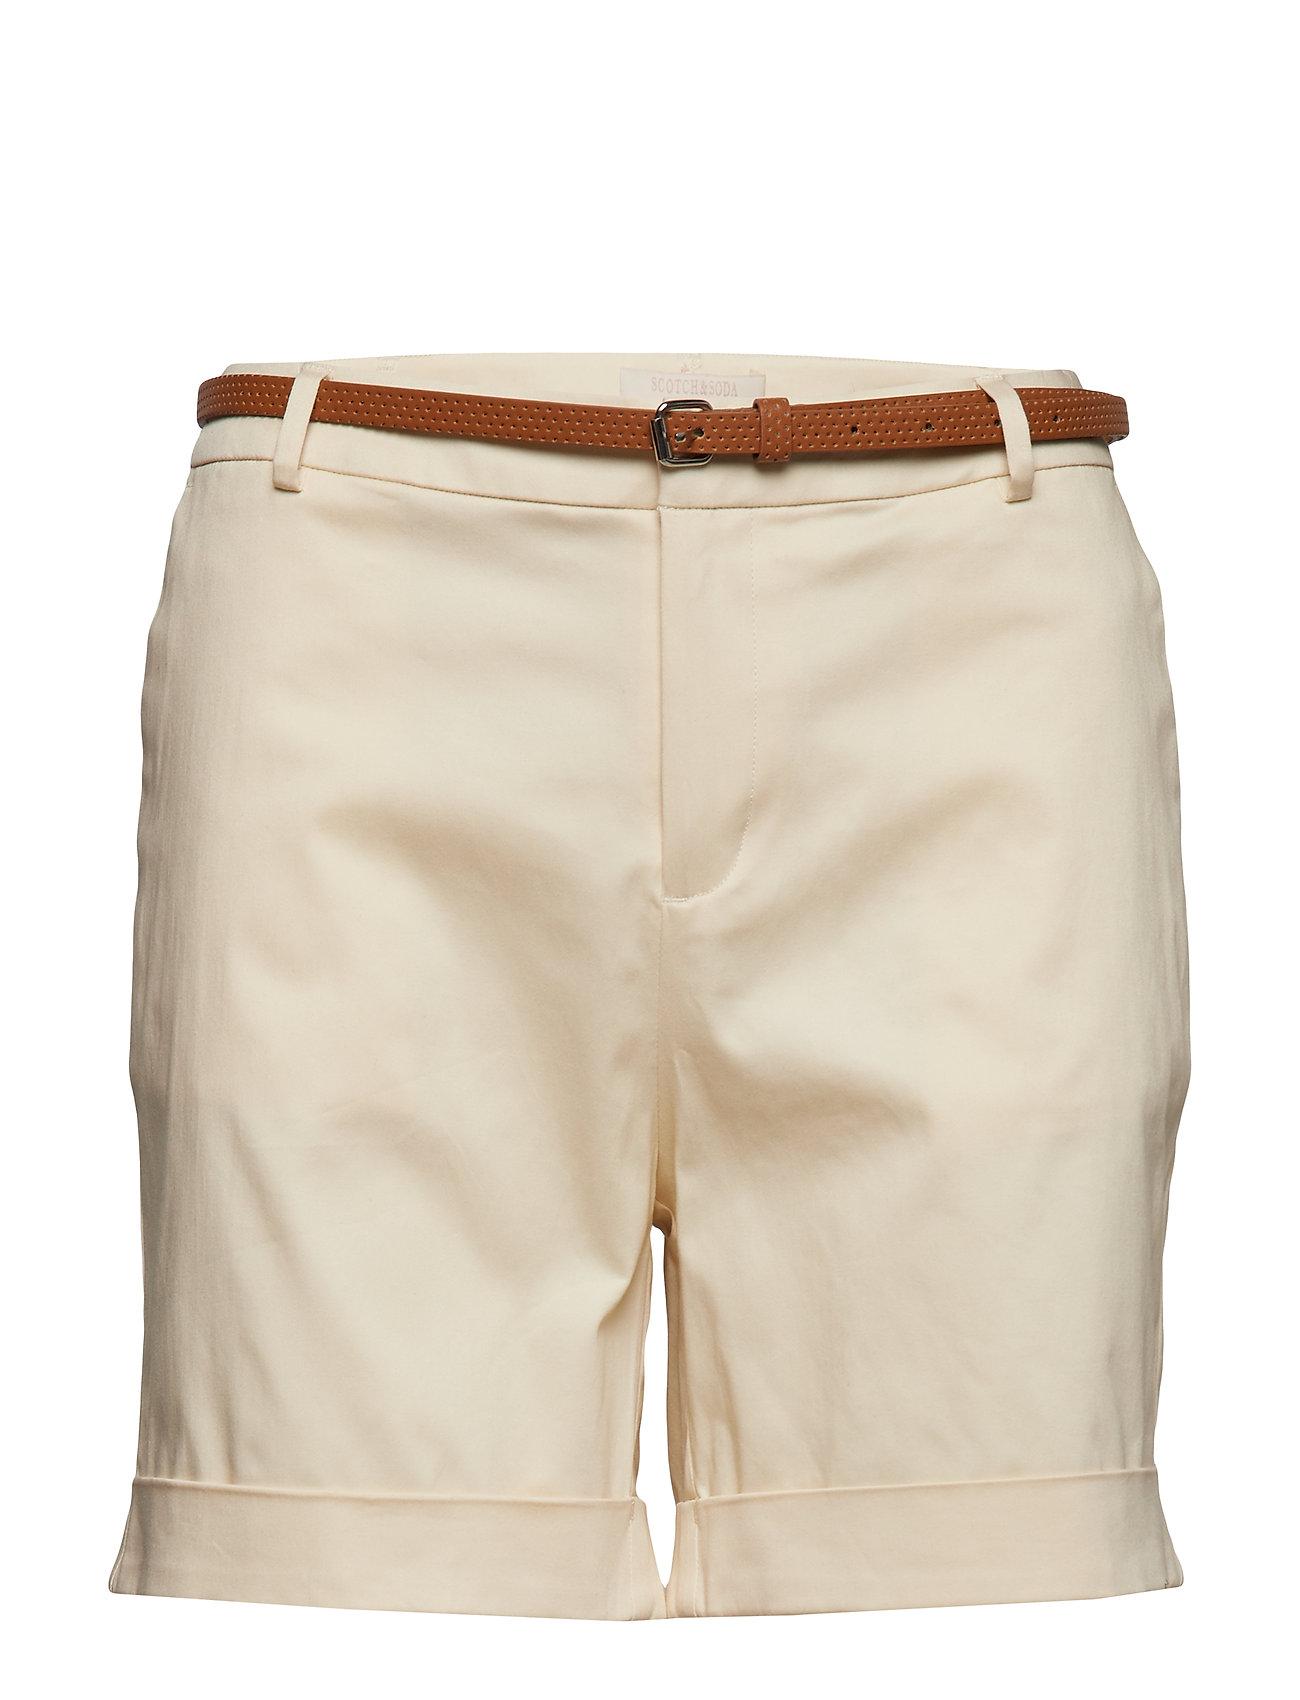 Scotch & Soda Longer length mercerised chino shorts, sold with a belt - ANTIQUE WHITE